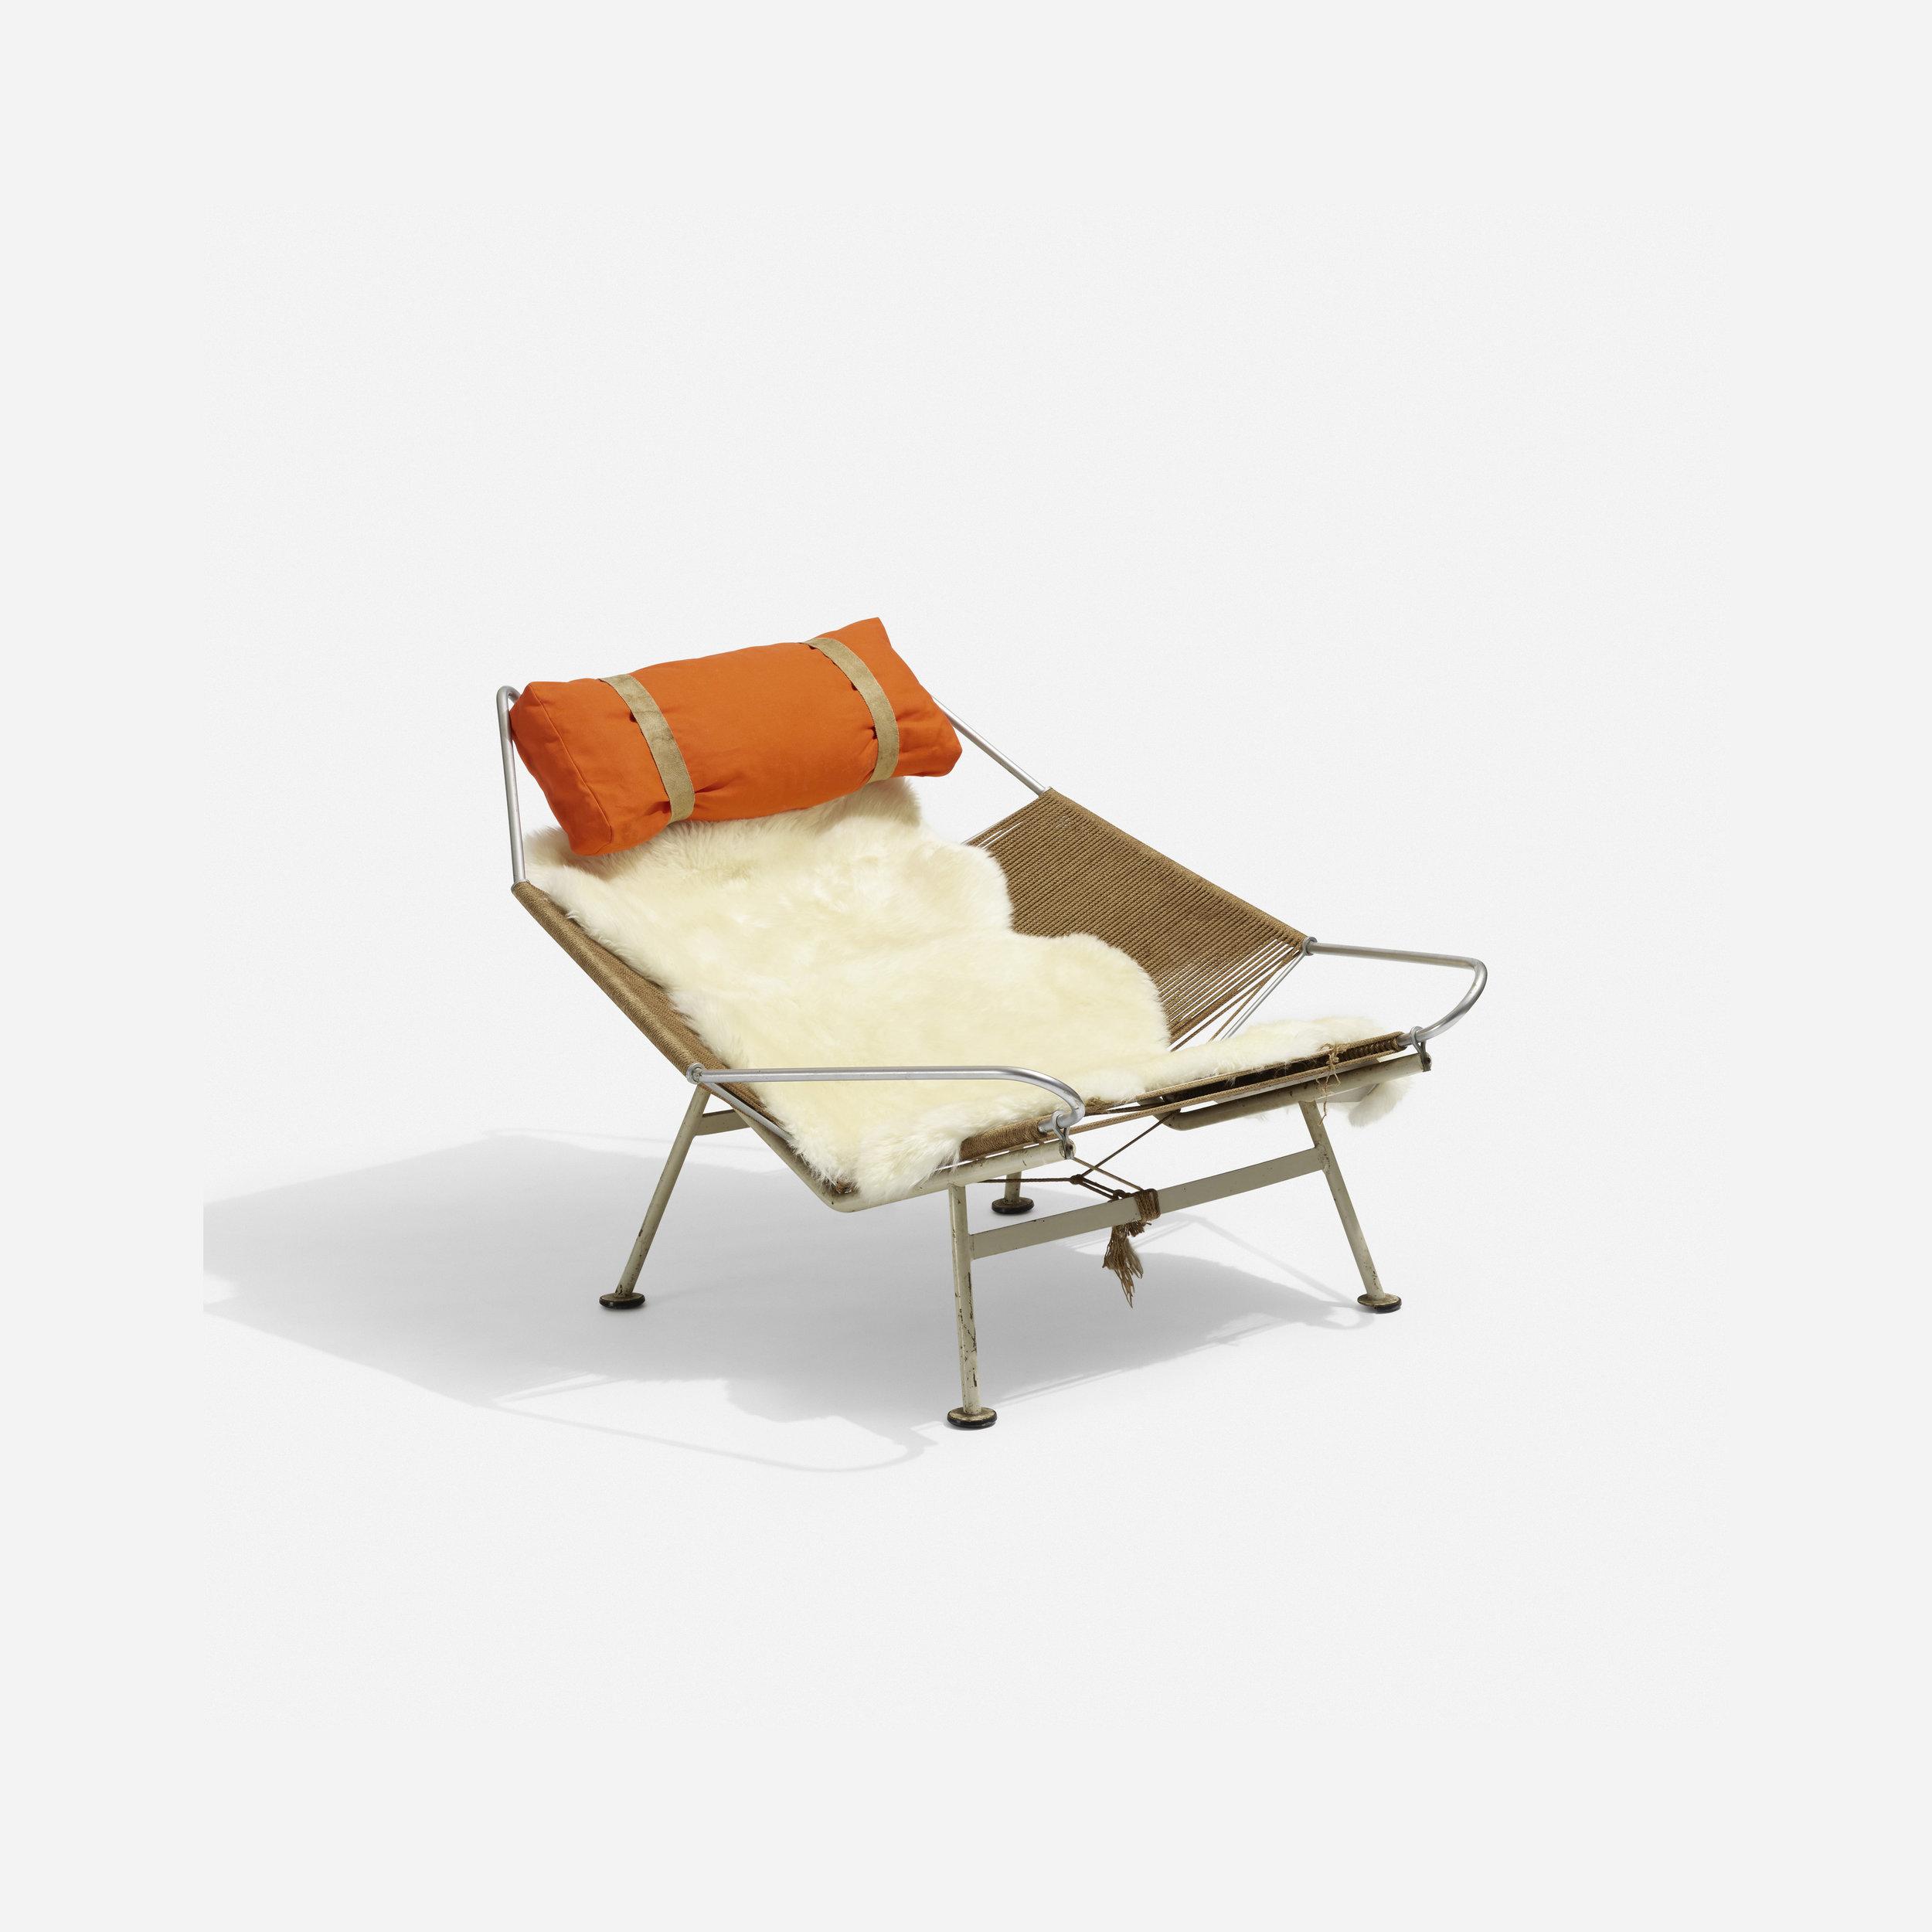 107_1_scandinavian_design_october_2018_hans_j_wegner_flag_halyard_lounge_chair__wright_auction.jpg